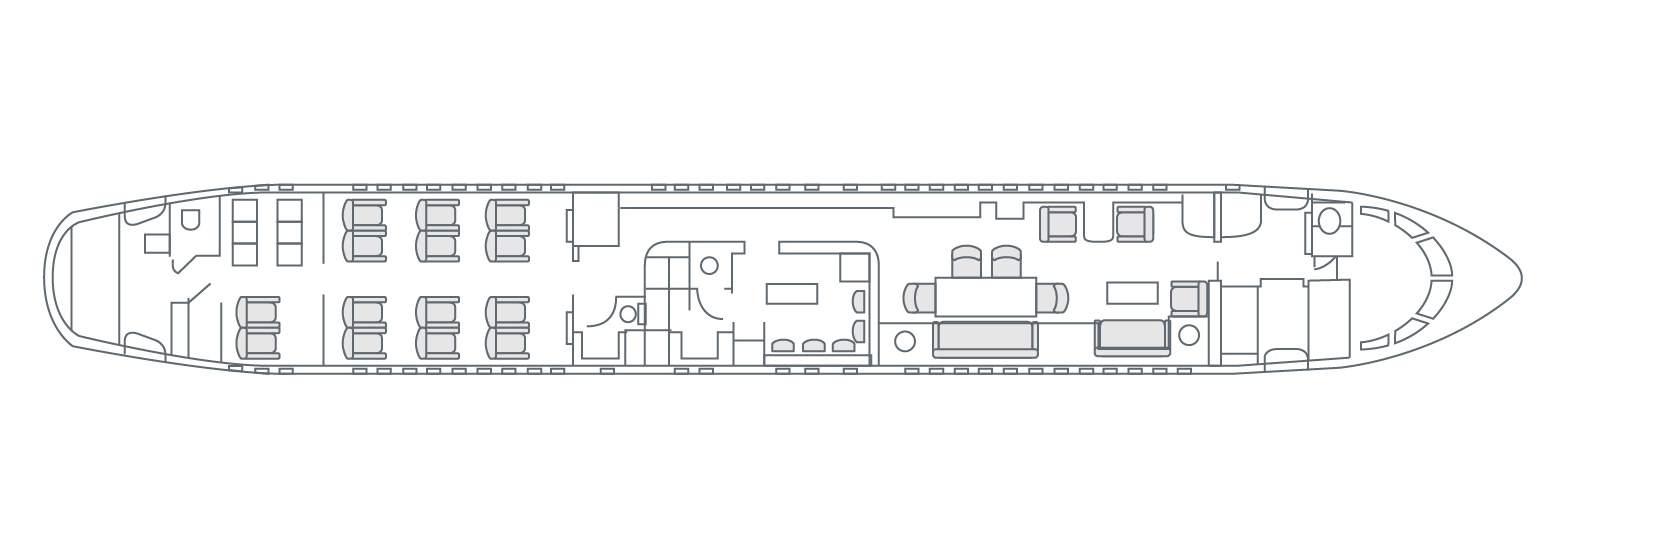 Mapa Asiento_Airbus 320 Prestige.jpg